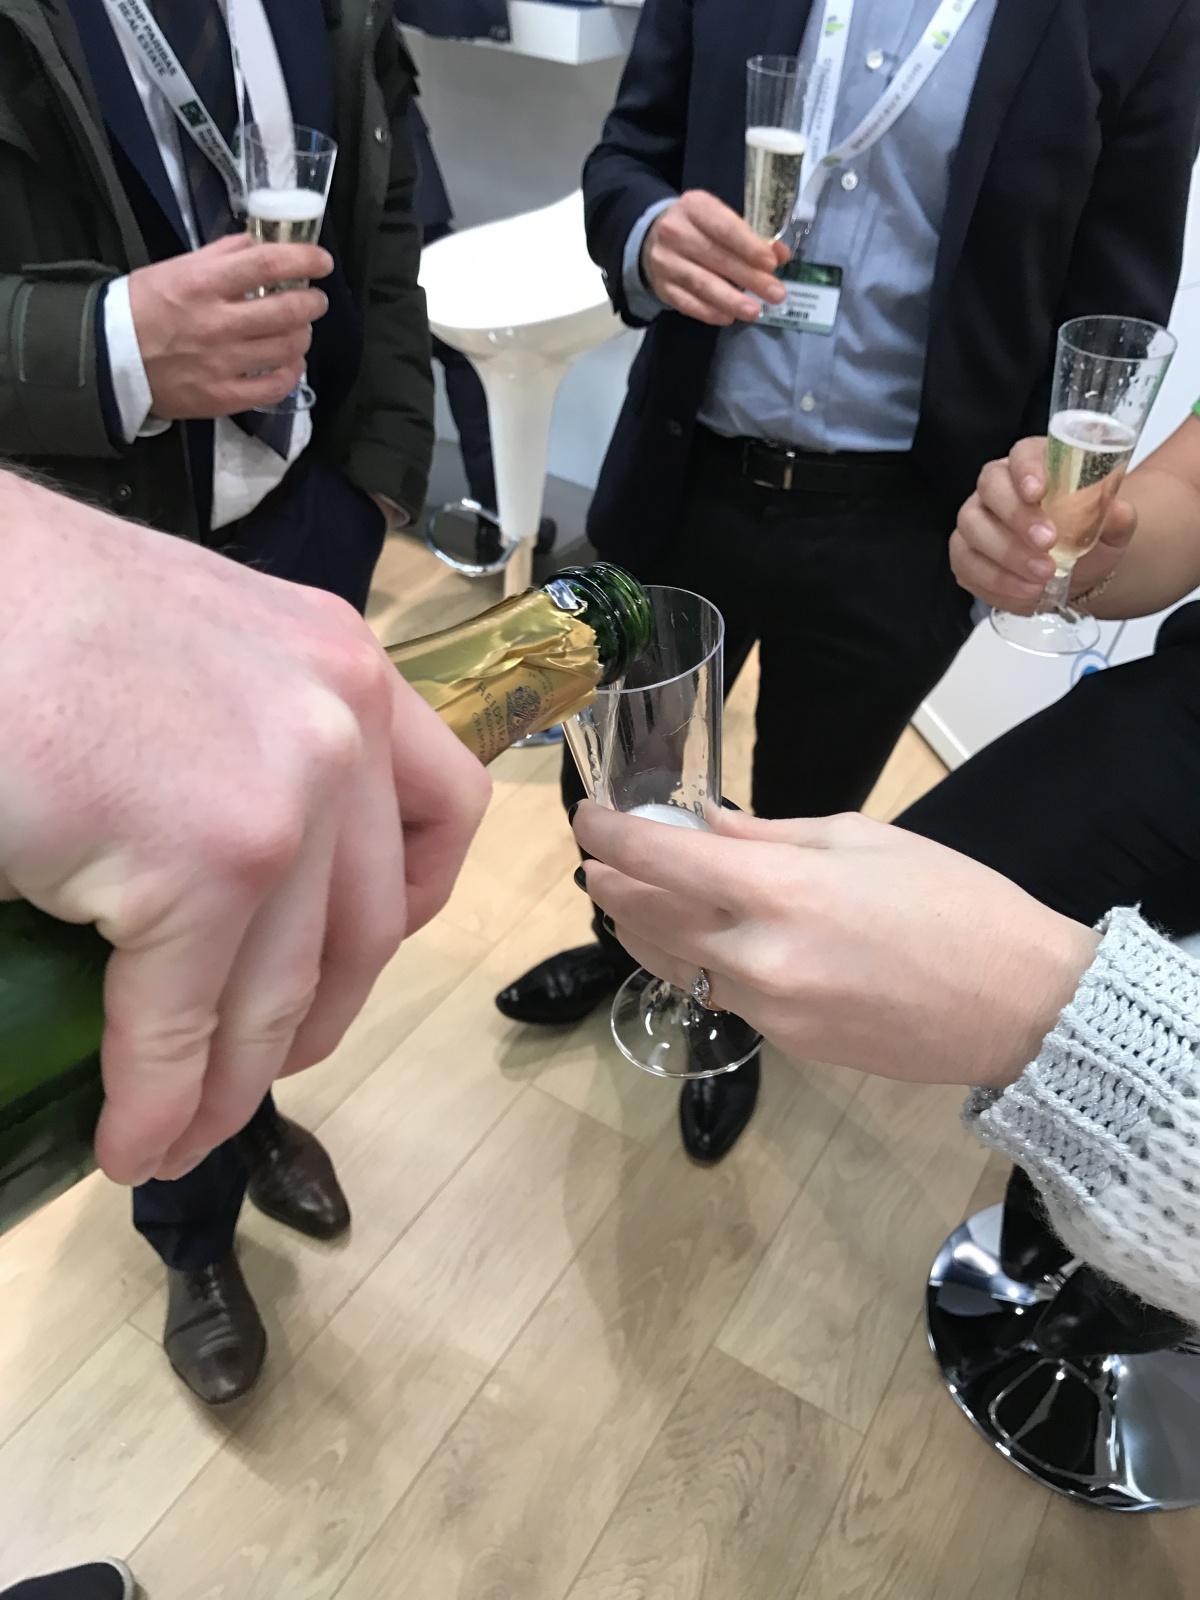 geolocaux-simi16-champagne